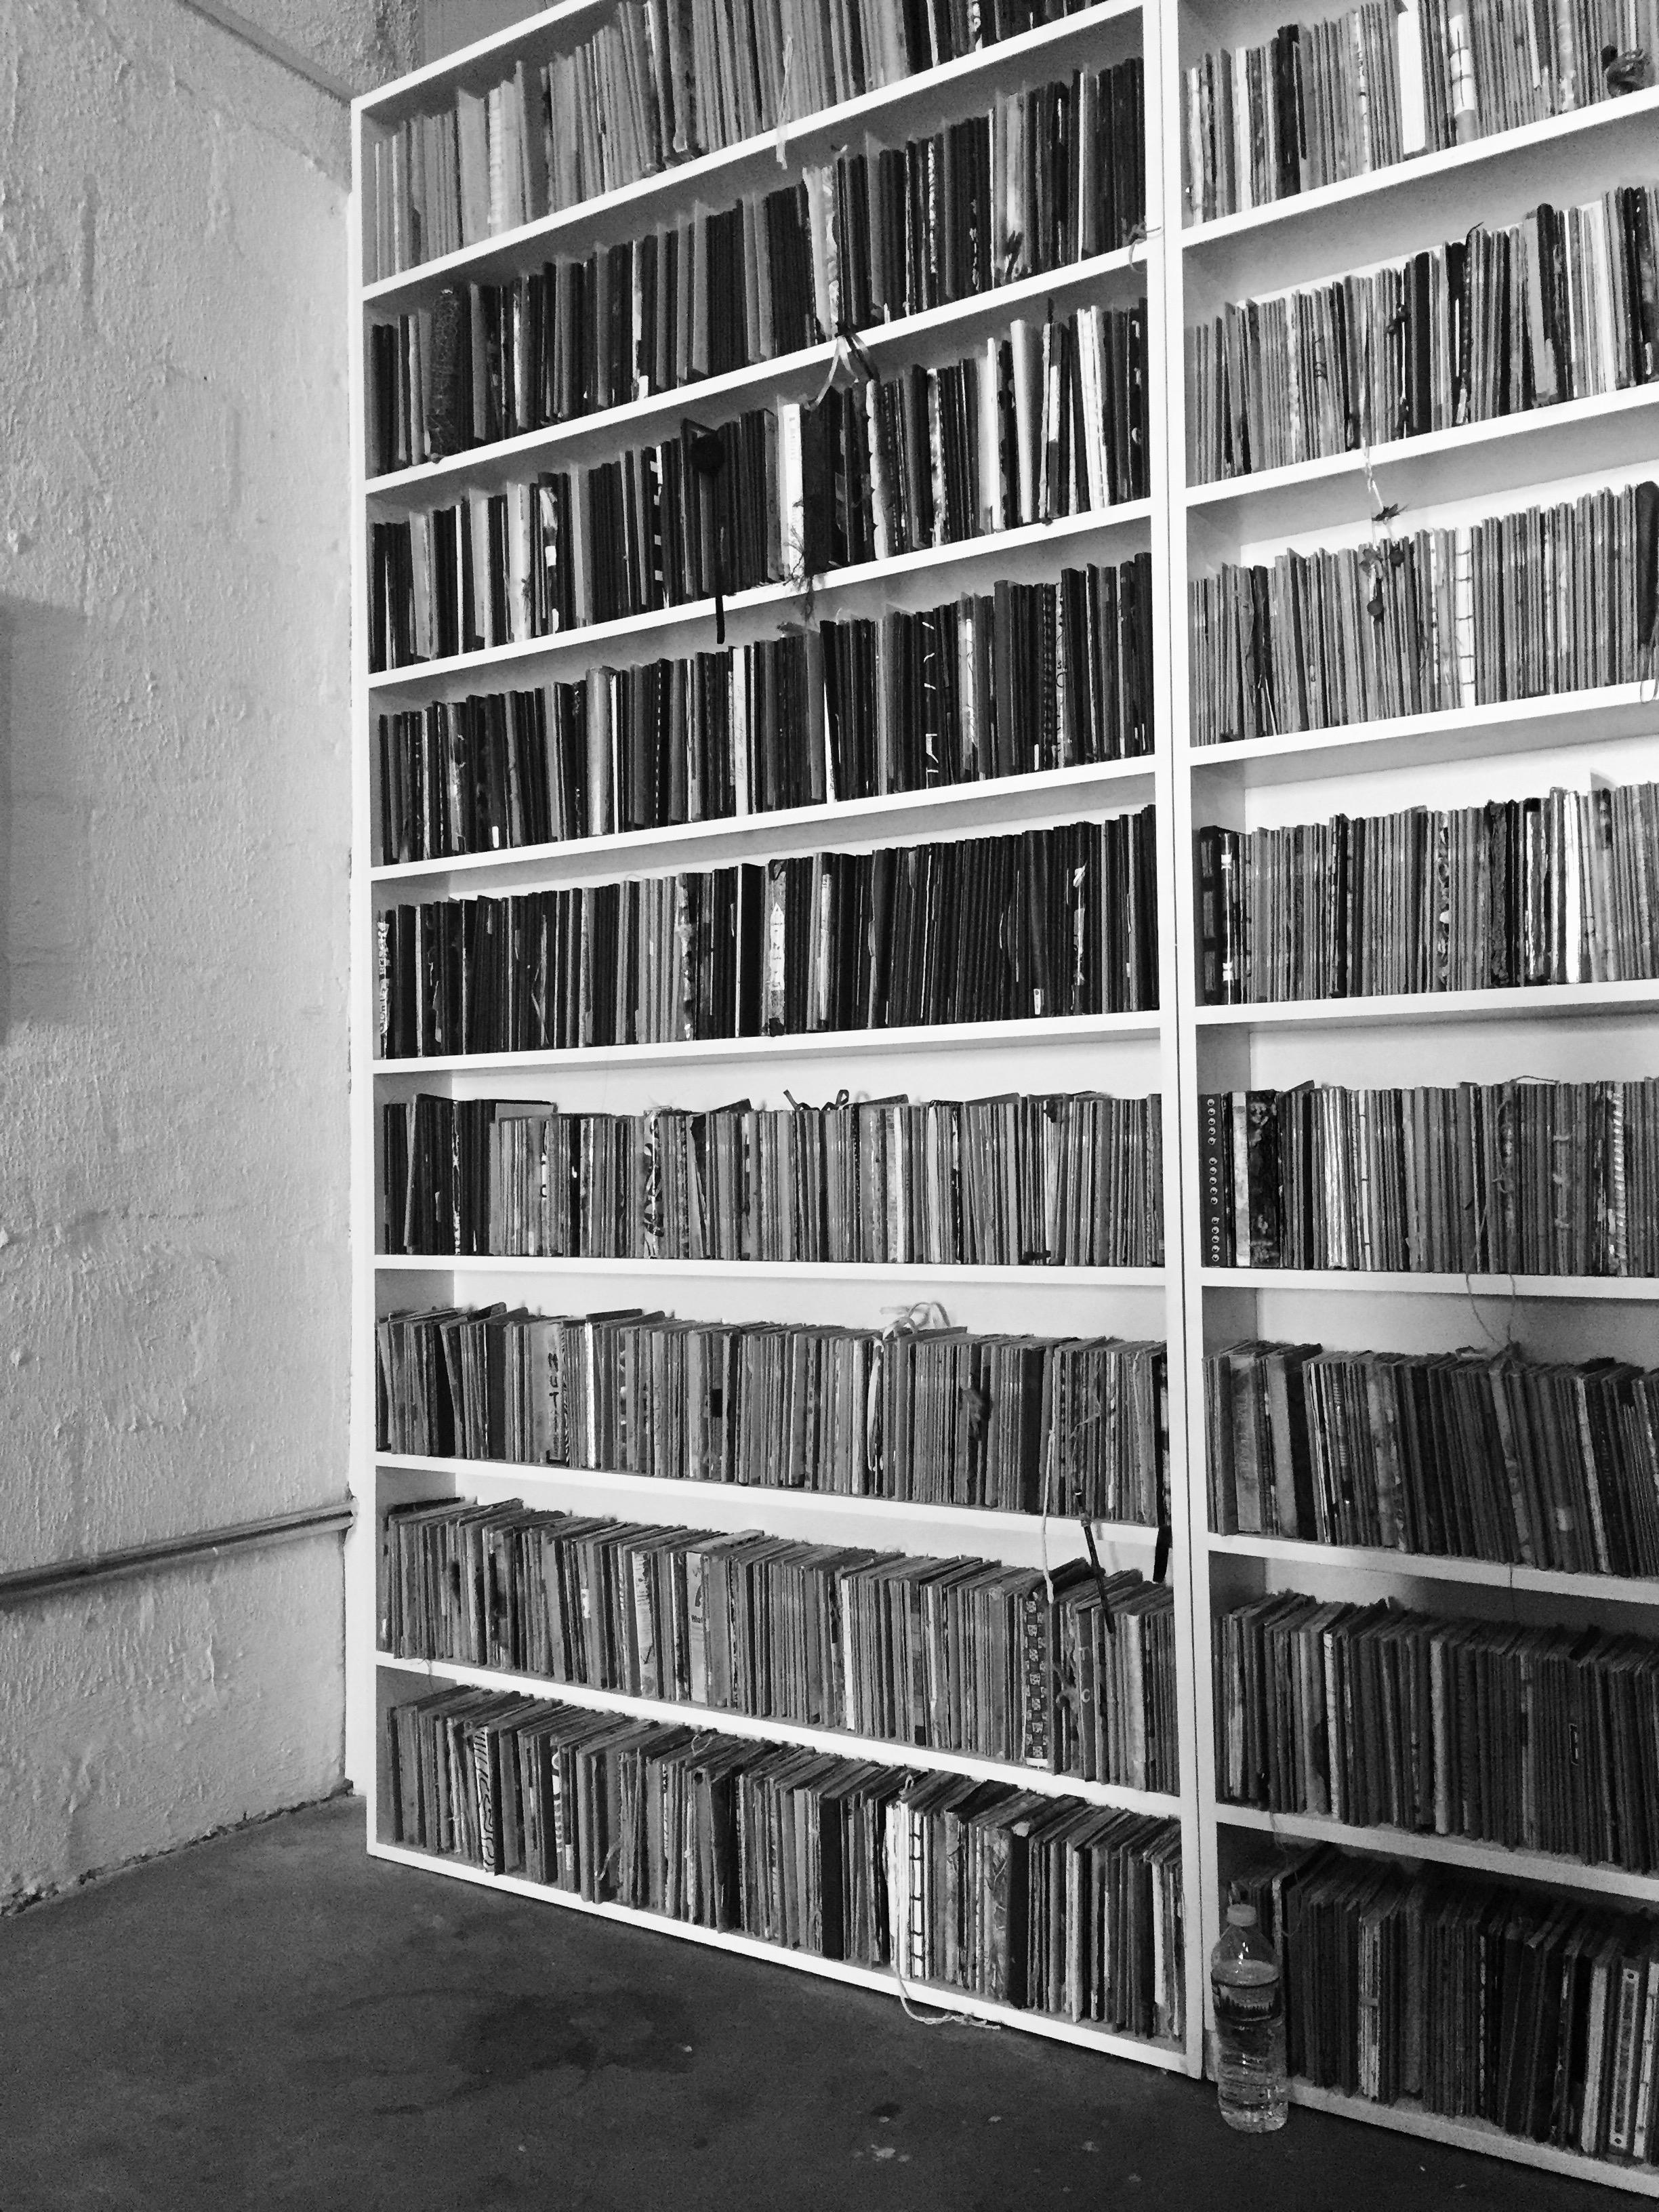 Bookshelves showing rows of sketchbooks